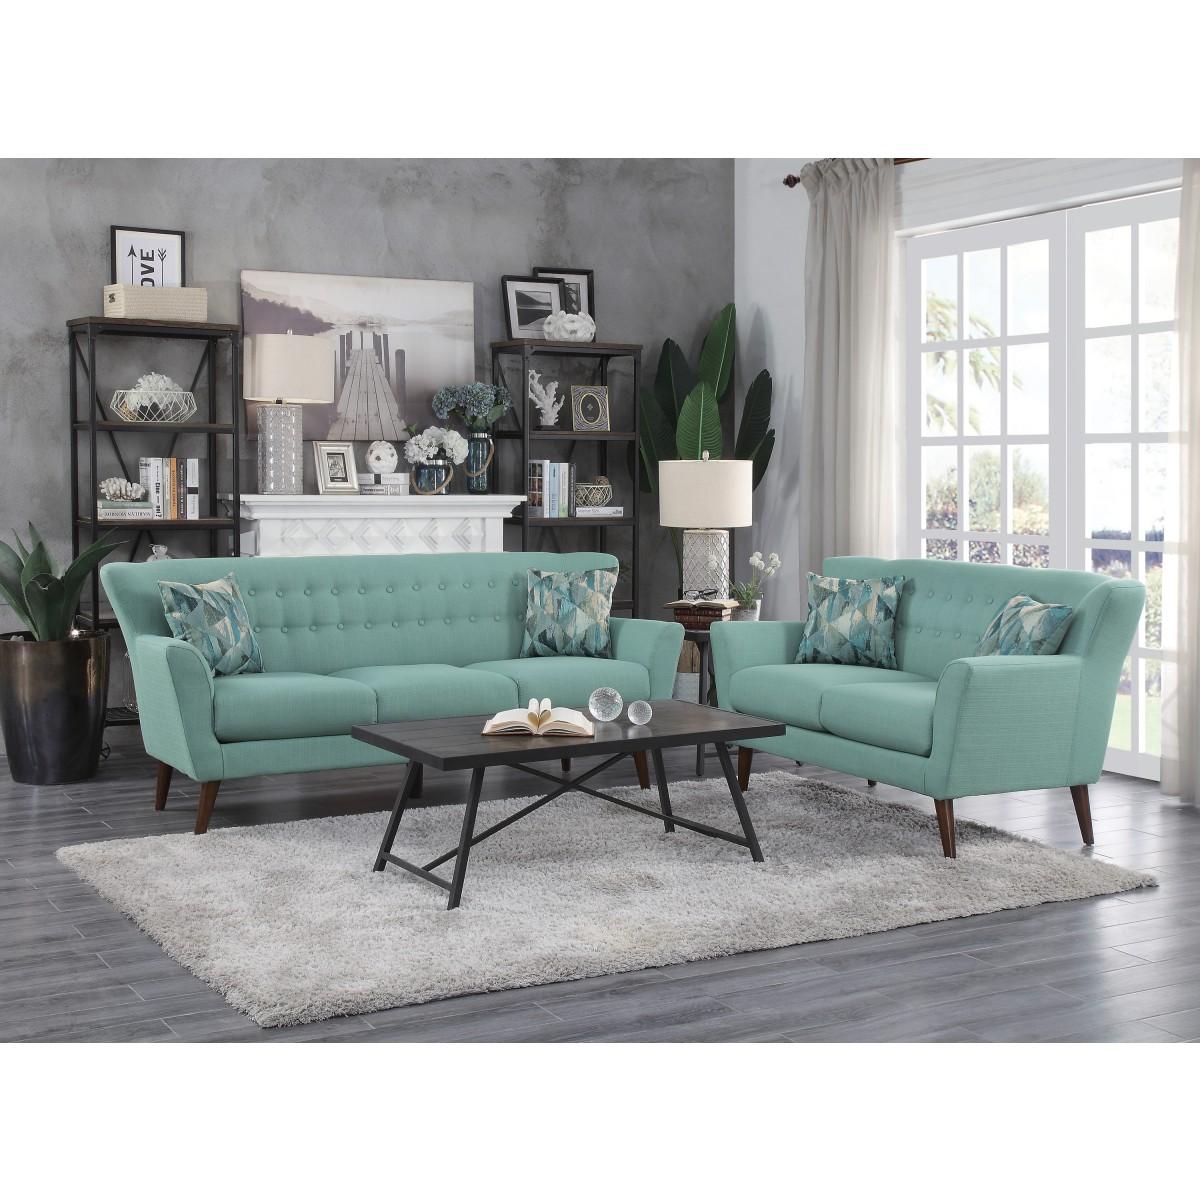 2PC Living Set (Sofa + Loveseat)